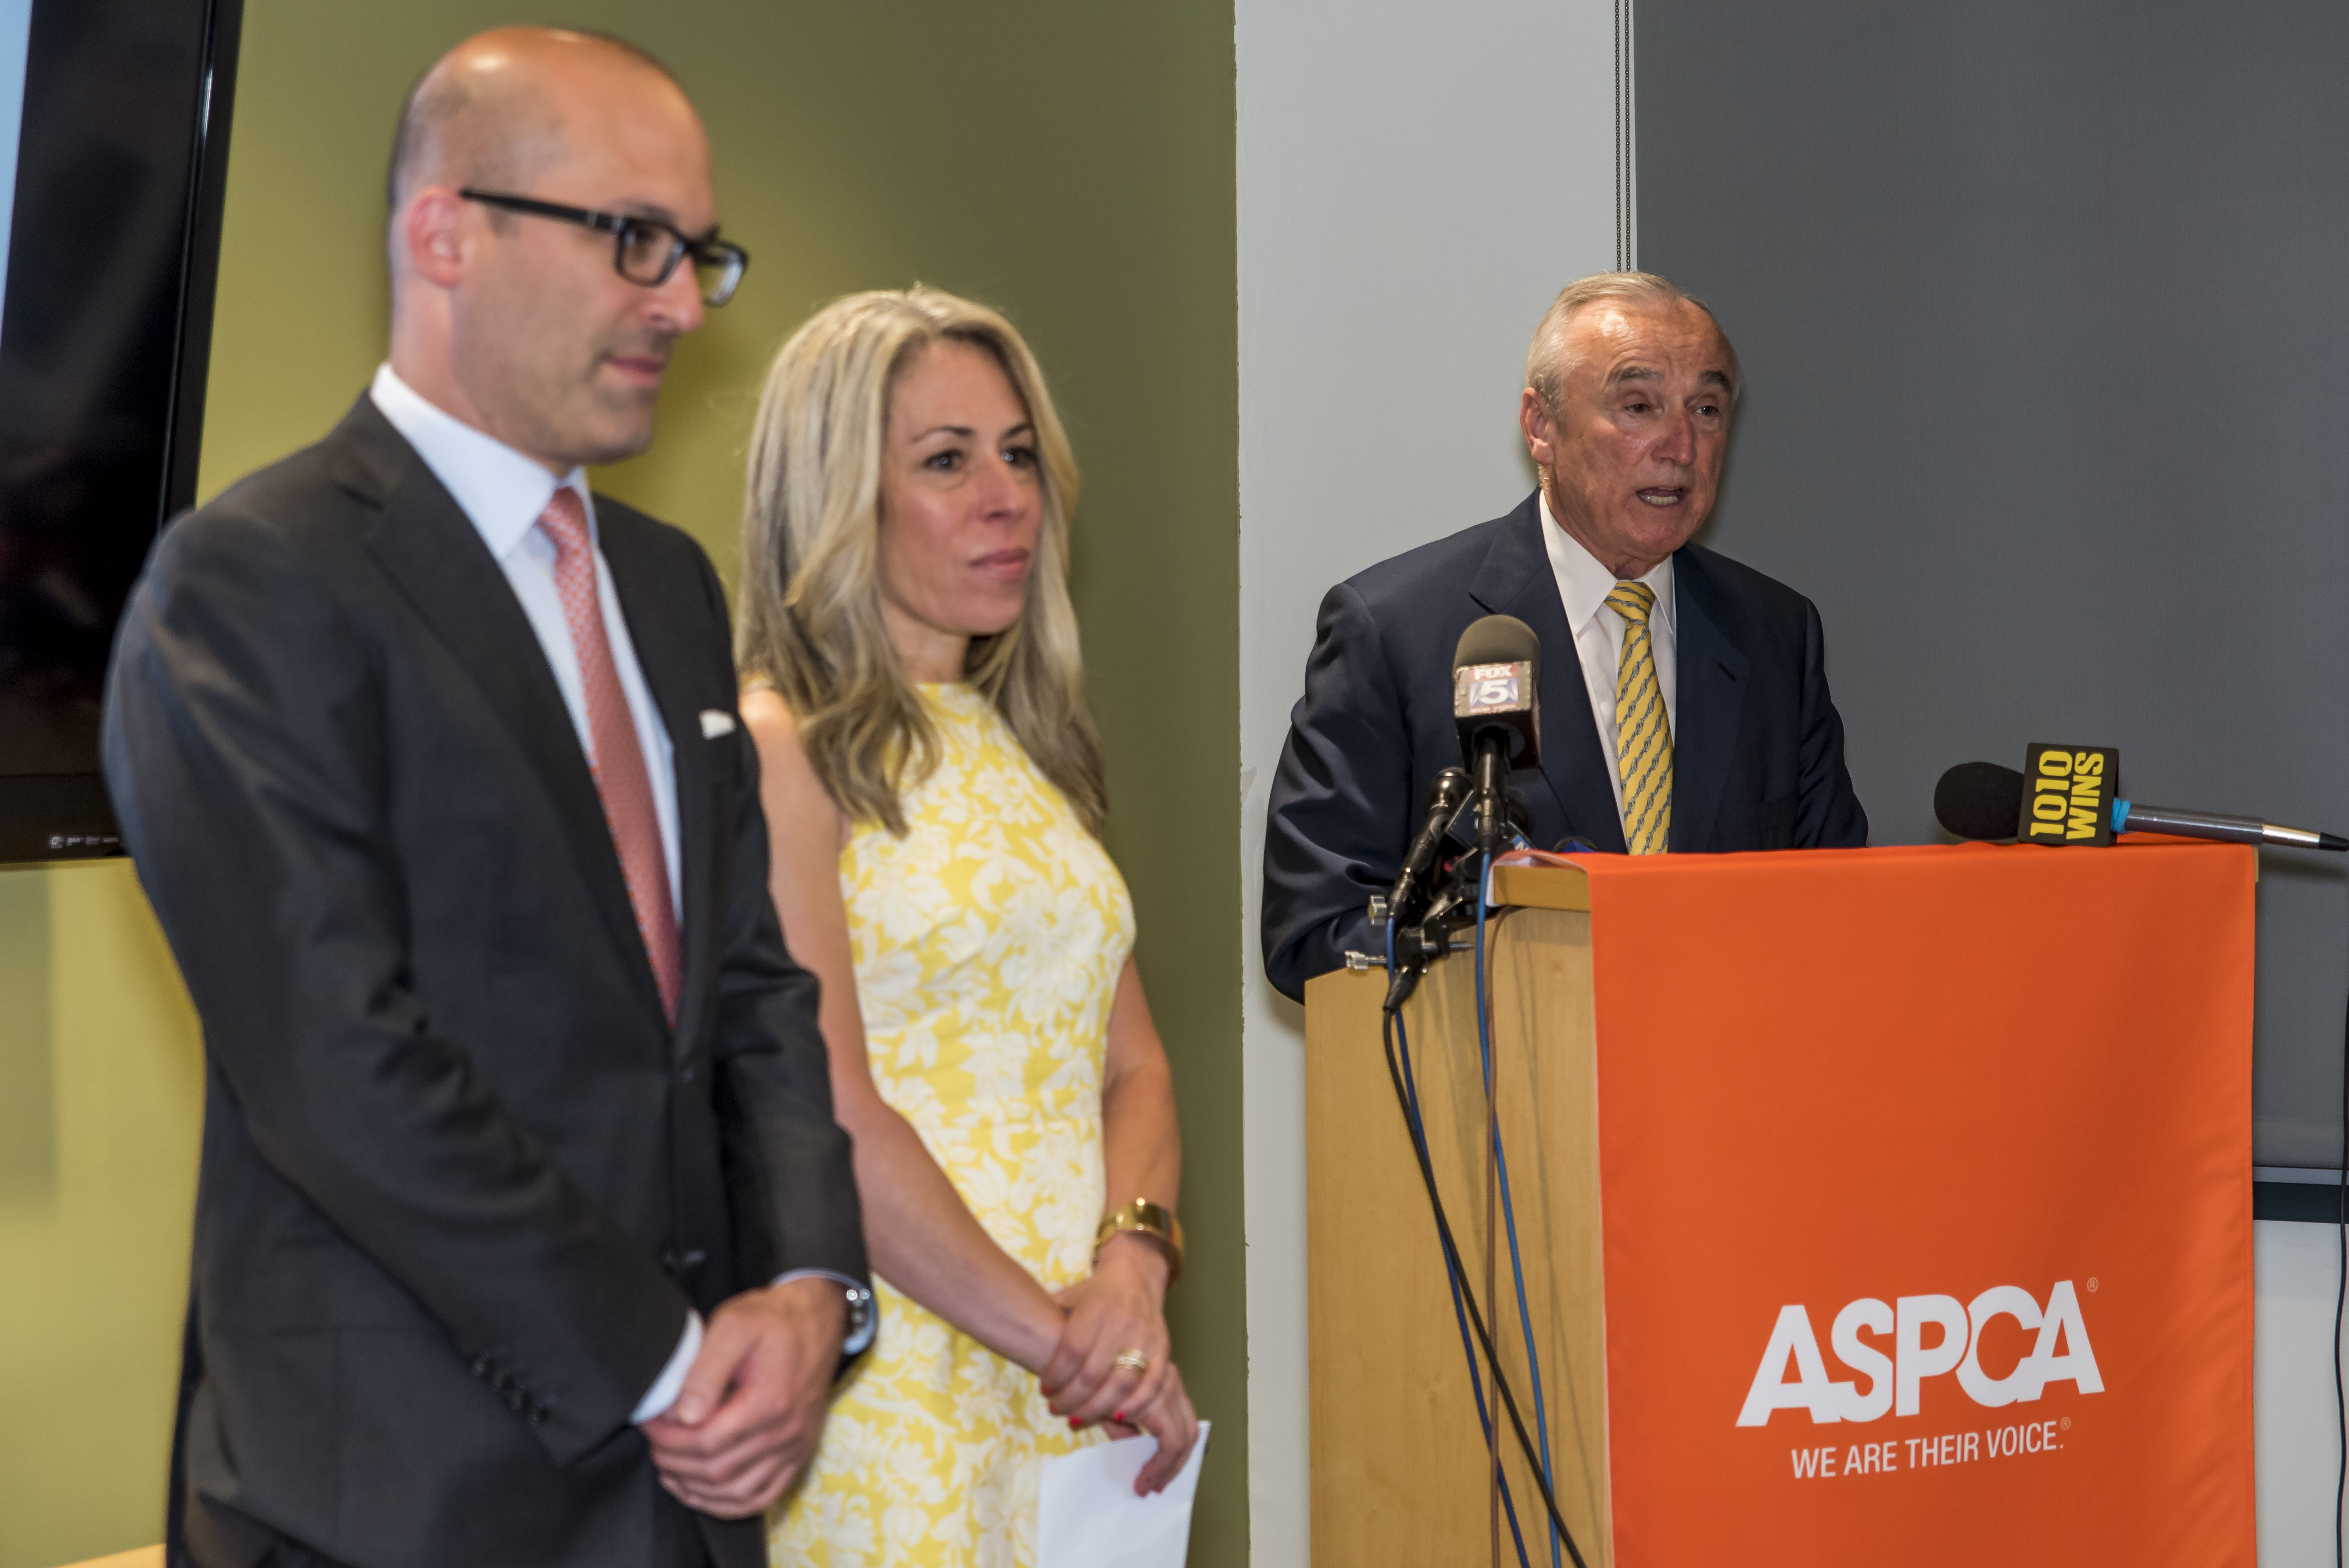 (l-r) Matt Bershadker, President & CEO, ASPCA; Susan L. Birnbaum, President & CEO, NYC Police Foundation; and William J. Bratton, Commissioner, NYPD.